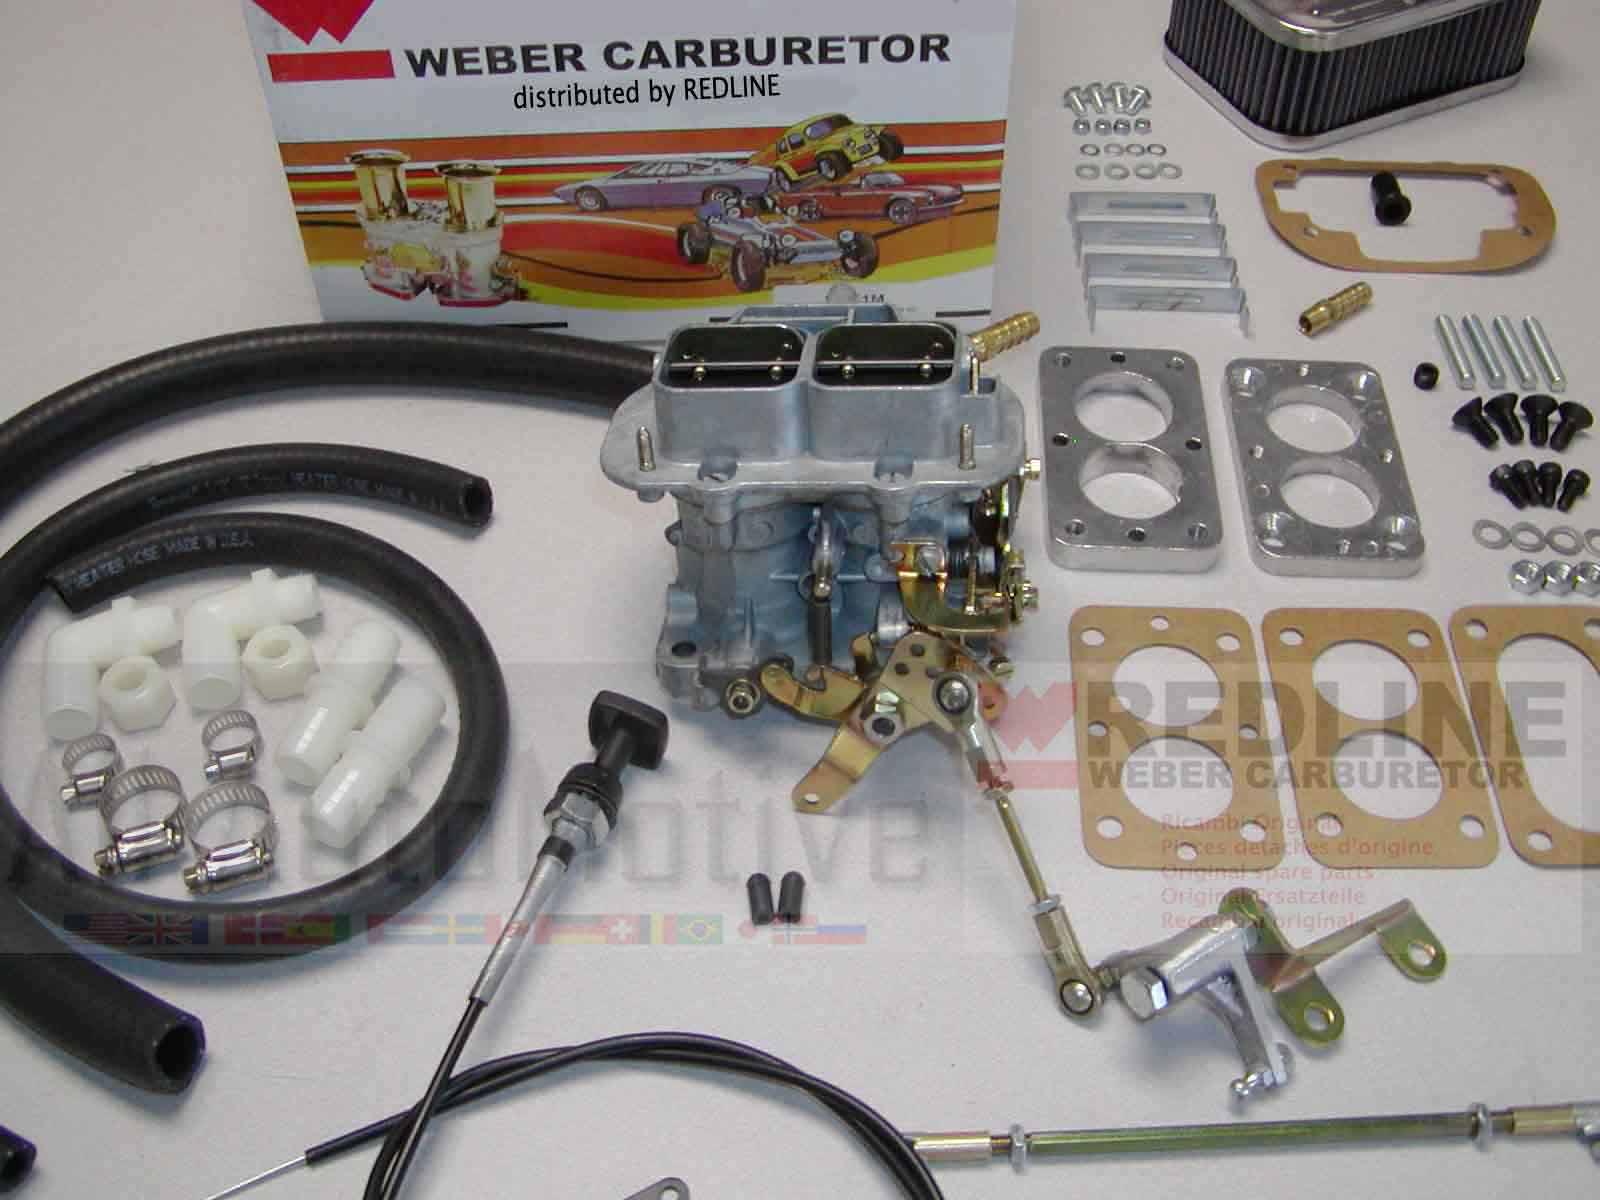 Stereo Wiring Diagram 1989 Jeep Wrangler Vacuum Diagram Jeep Wrangler